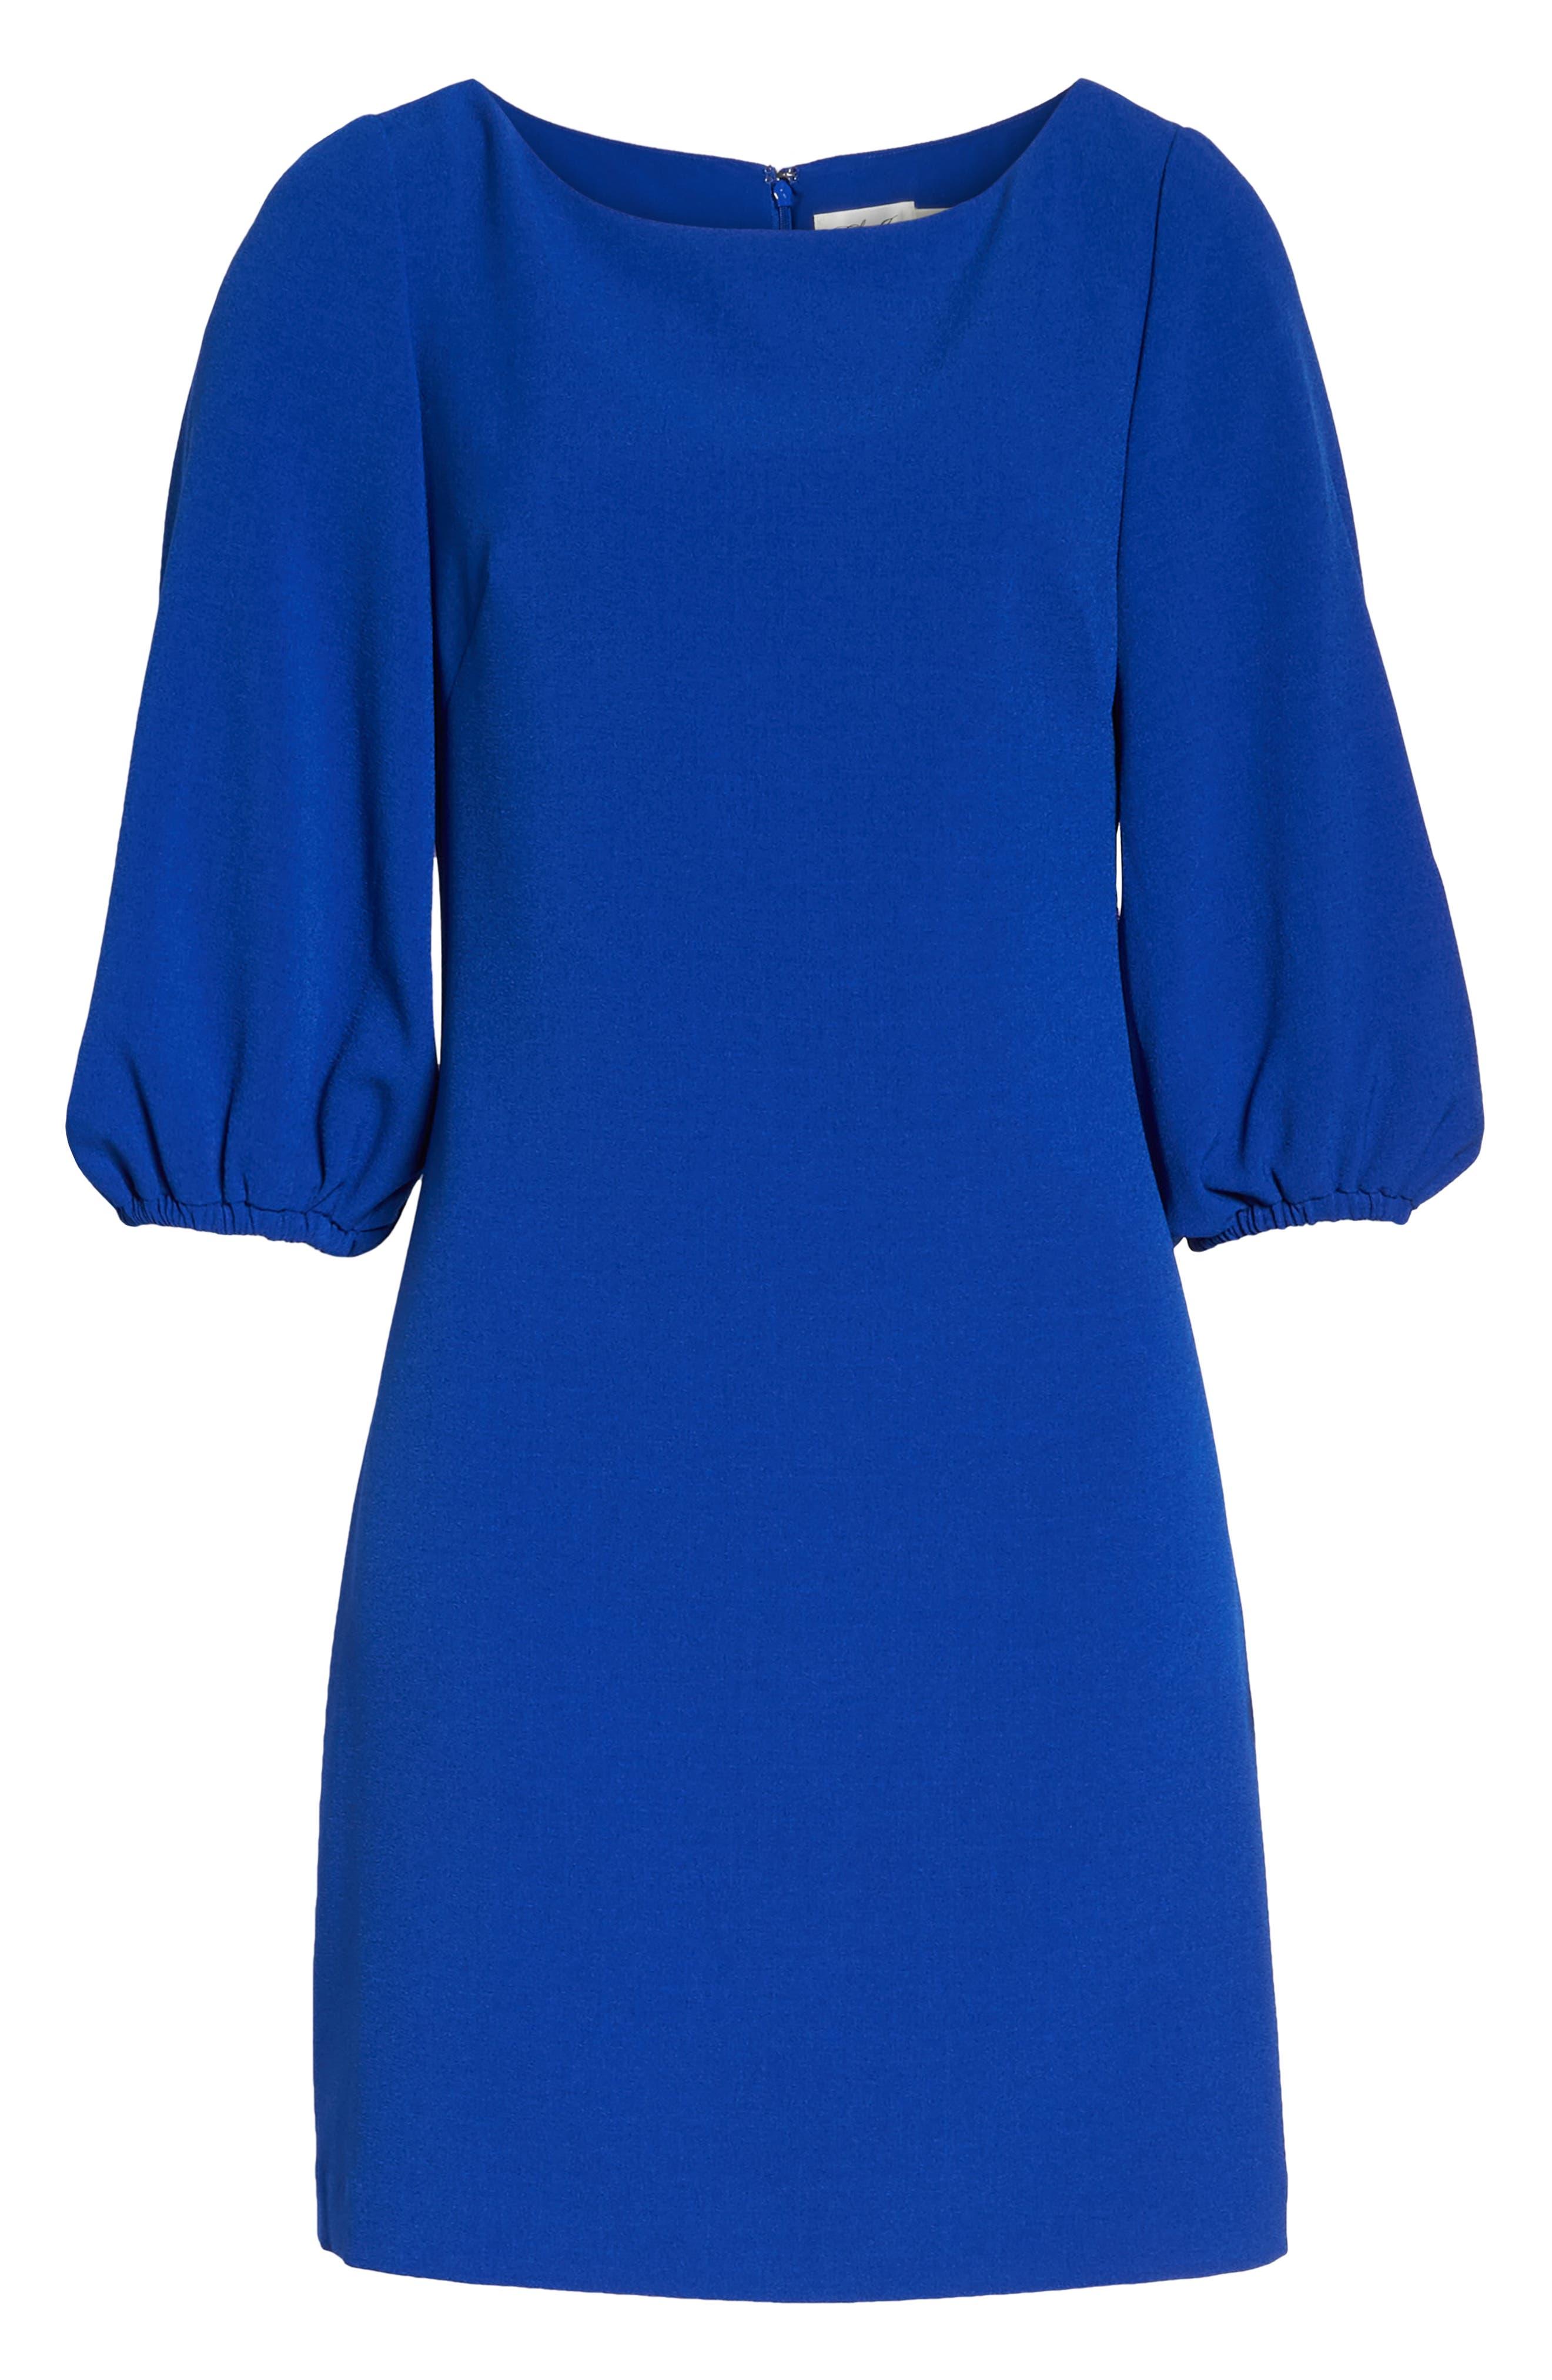 Bloused Sleeve Shift Dress,                             Alternate thumbnail 18, color,